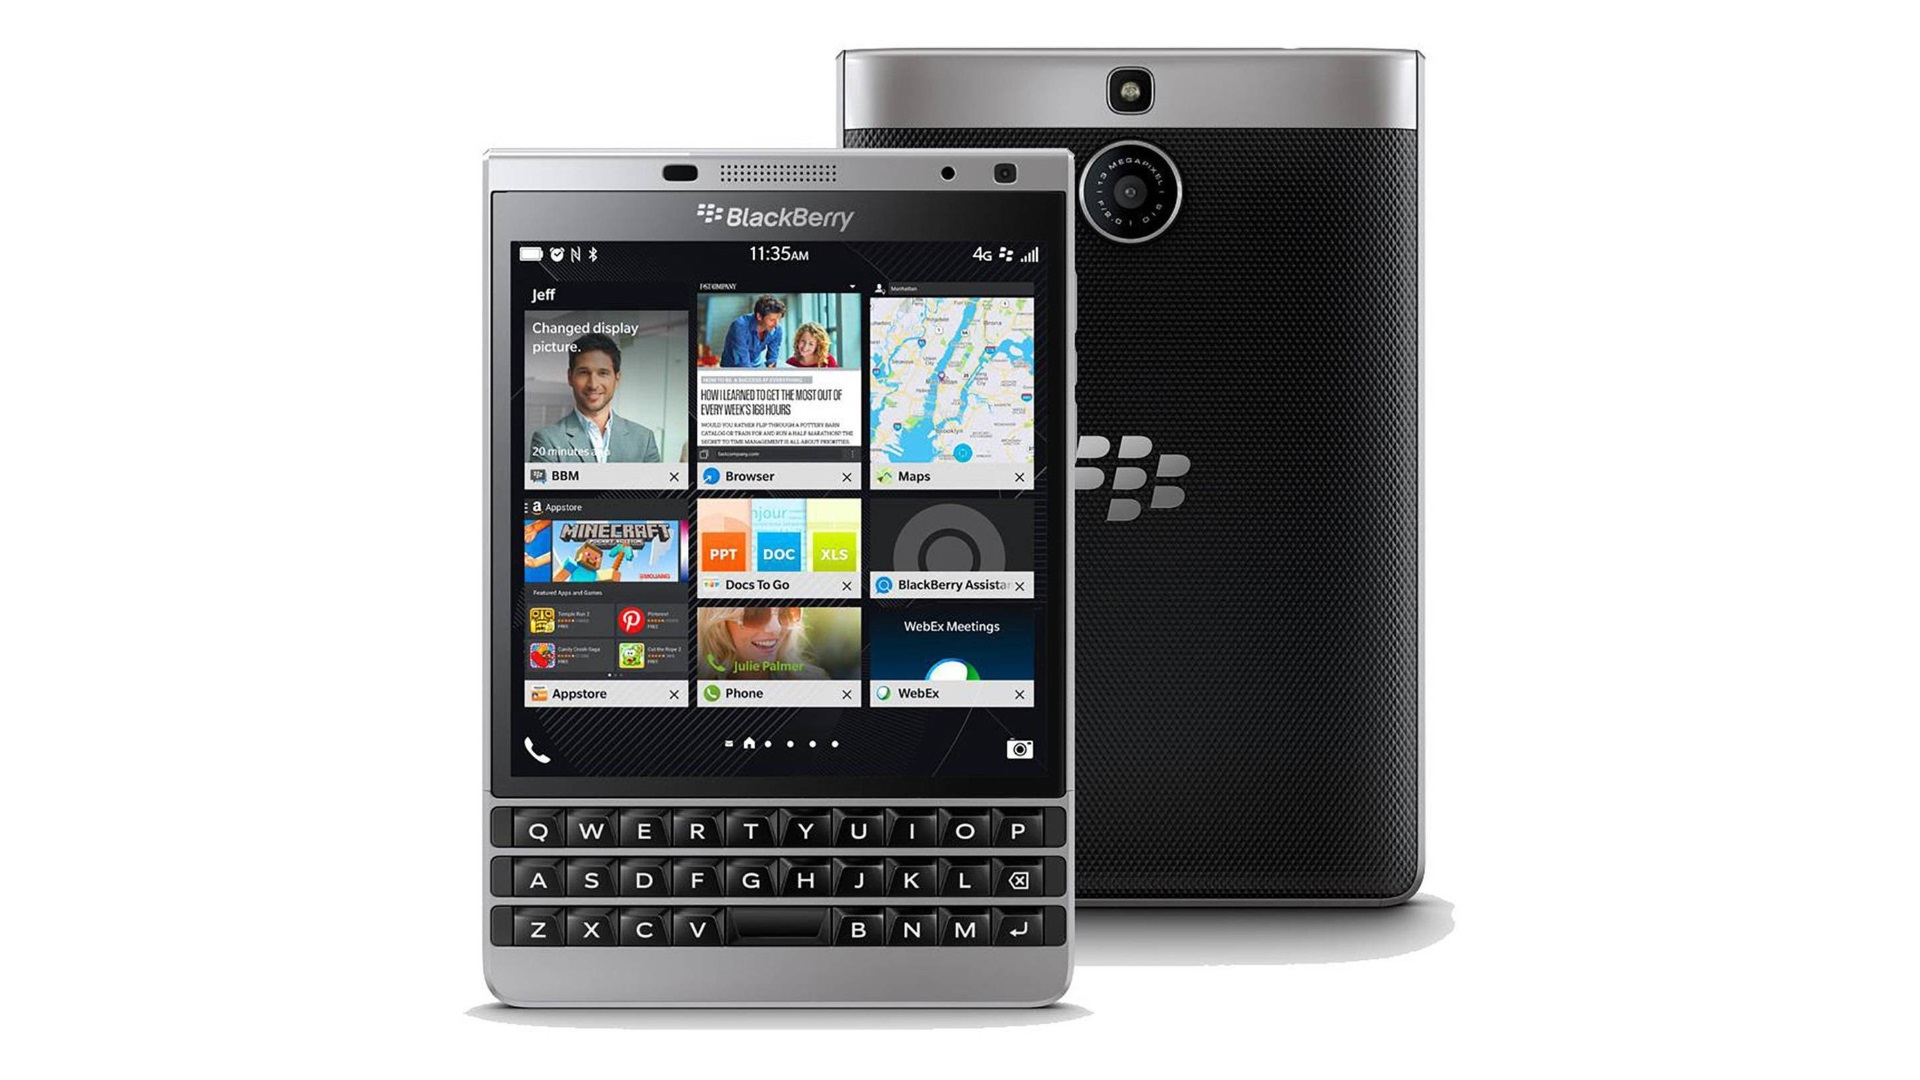 BlackBerry公式のBlackBerry StoreでBlackBerry OS 10端末の販売がついに終了、本当にありがとうございました